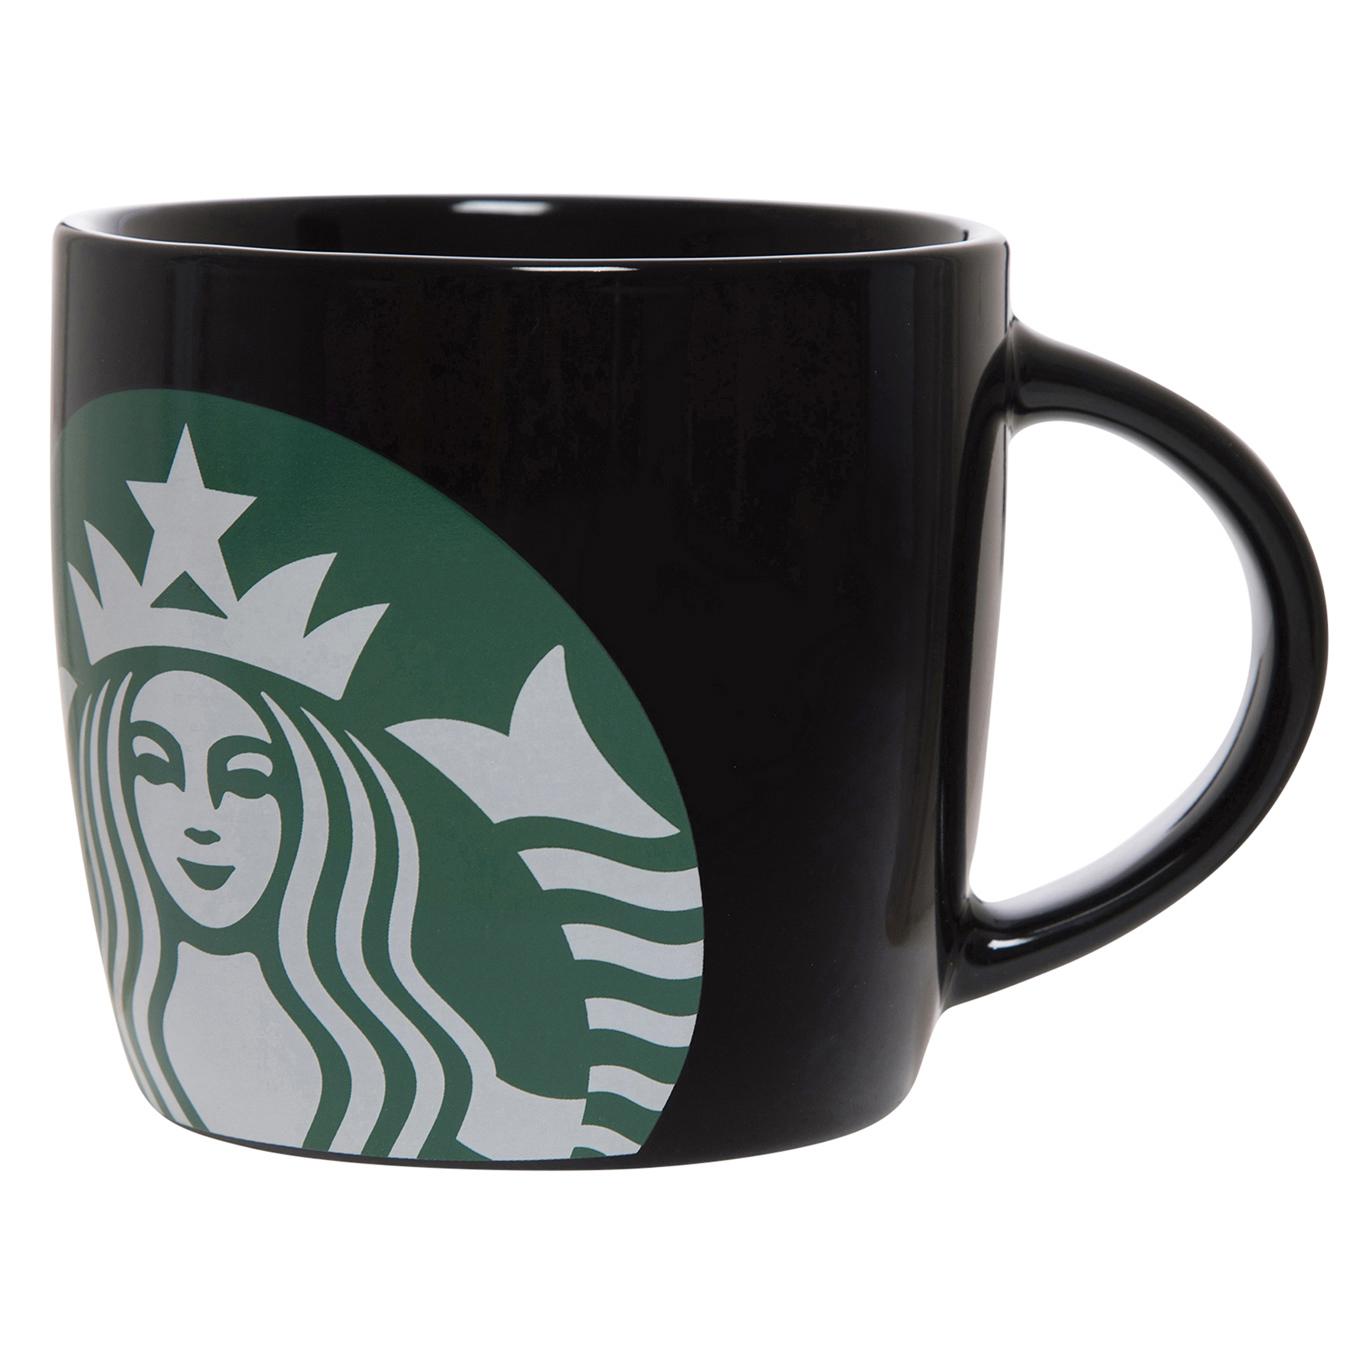 Starbucks 14oz Ceramic Mug Black